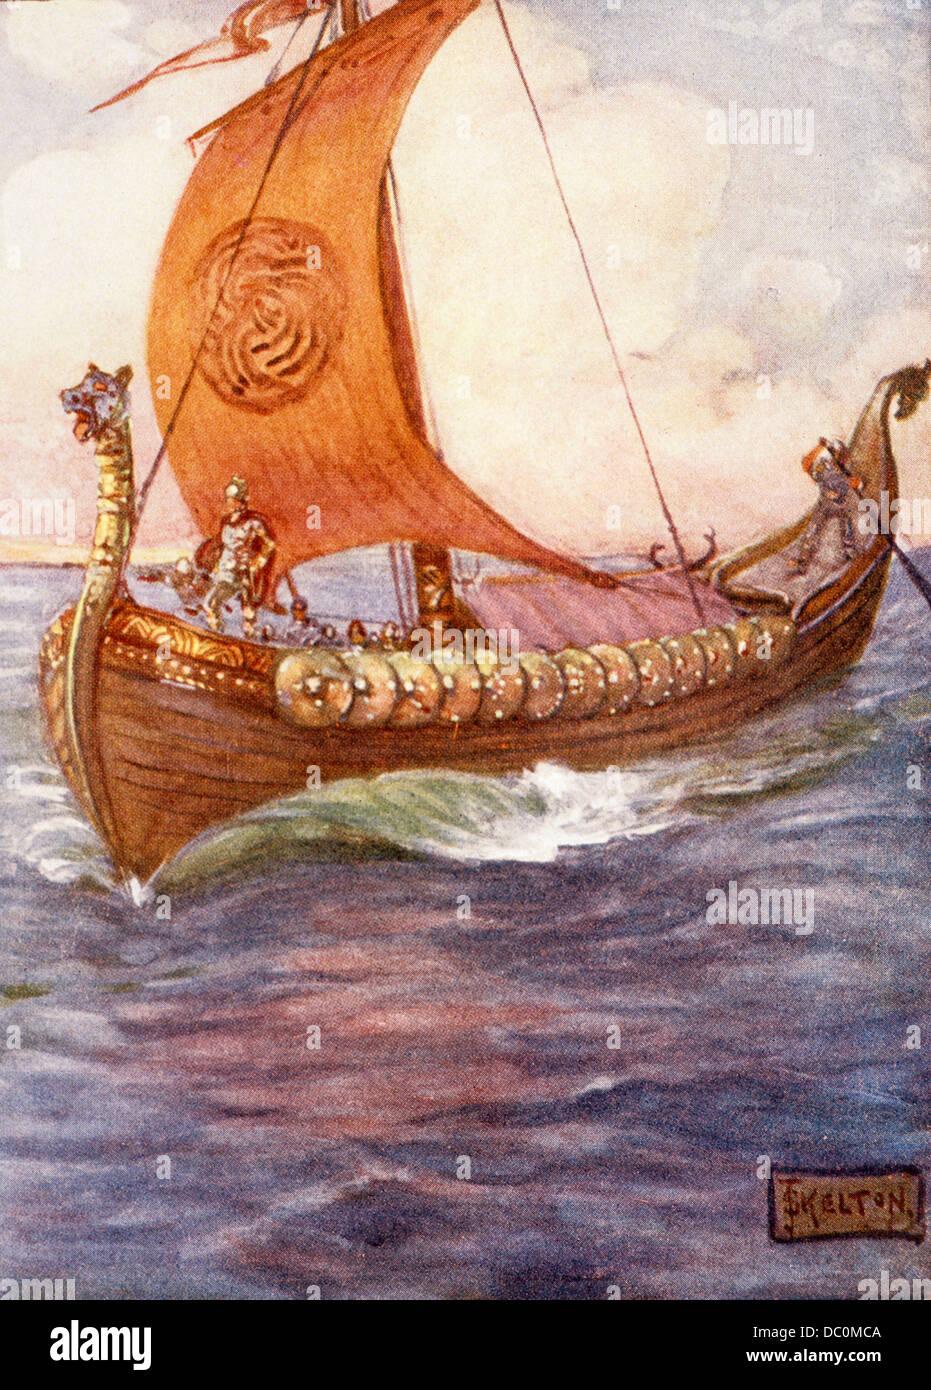 1890s ILLUSTRATION BY KELTON OF BEOWULF ON VIKING SHIP SETTING SAIL FOR DANELAND - Stock Image